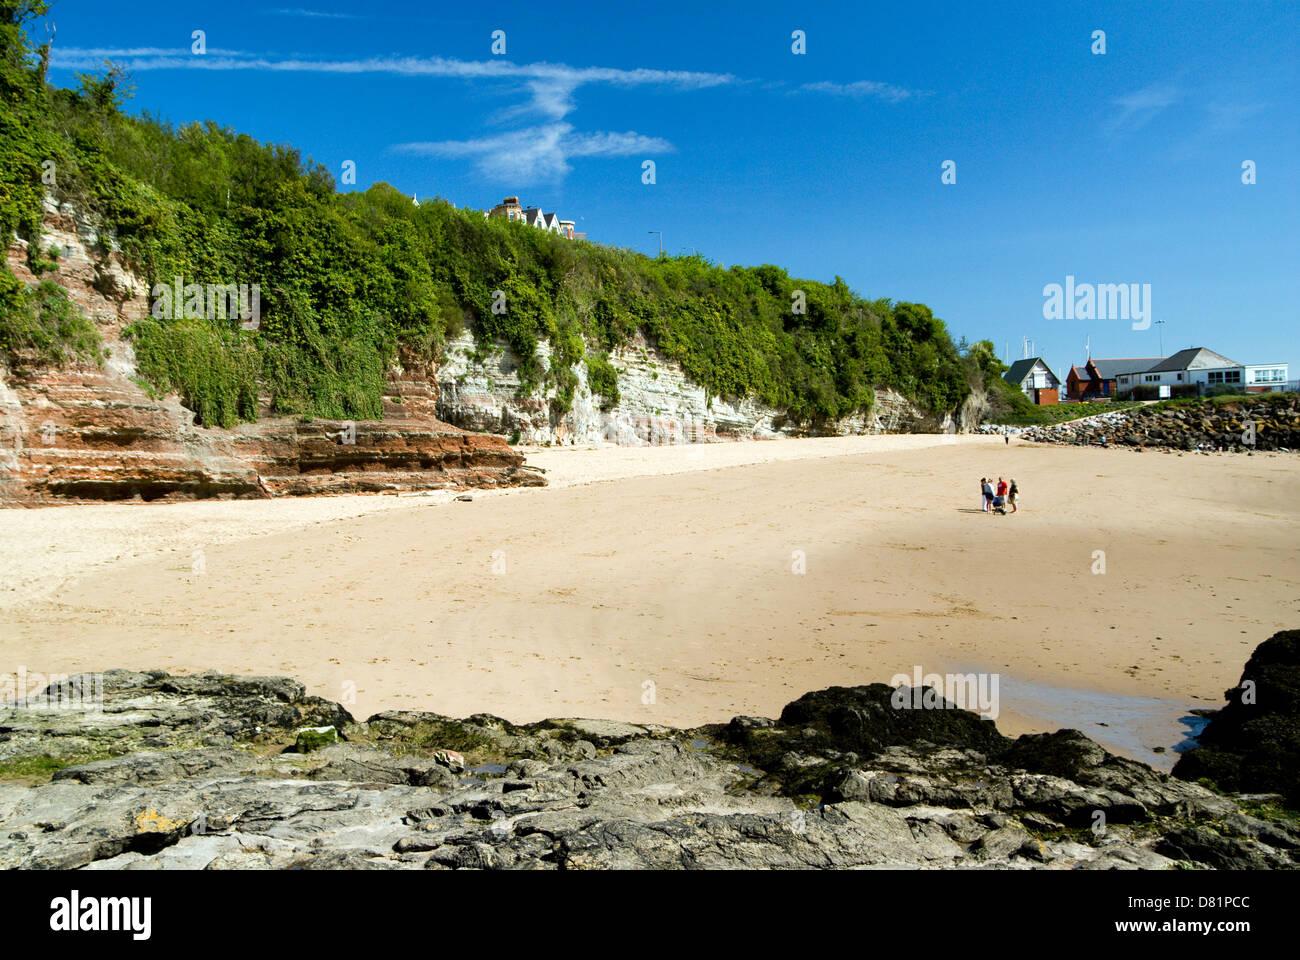 Beach Jacksons Bay, Barry Island, Vale of Glamorgan, South Wales, UK. Stock Photo